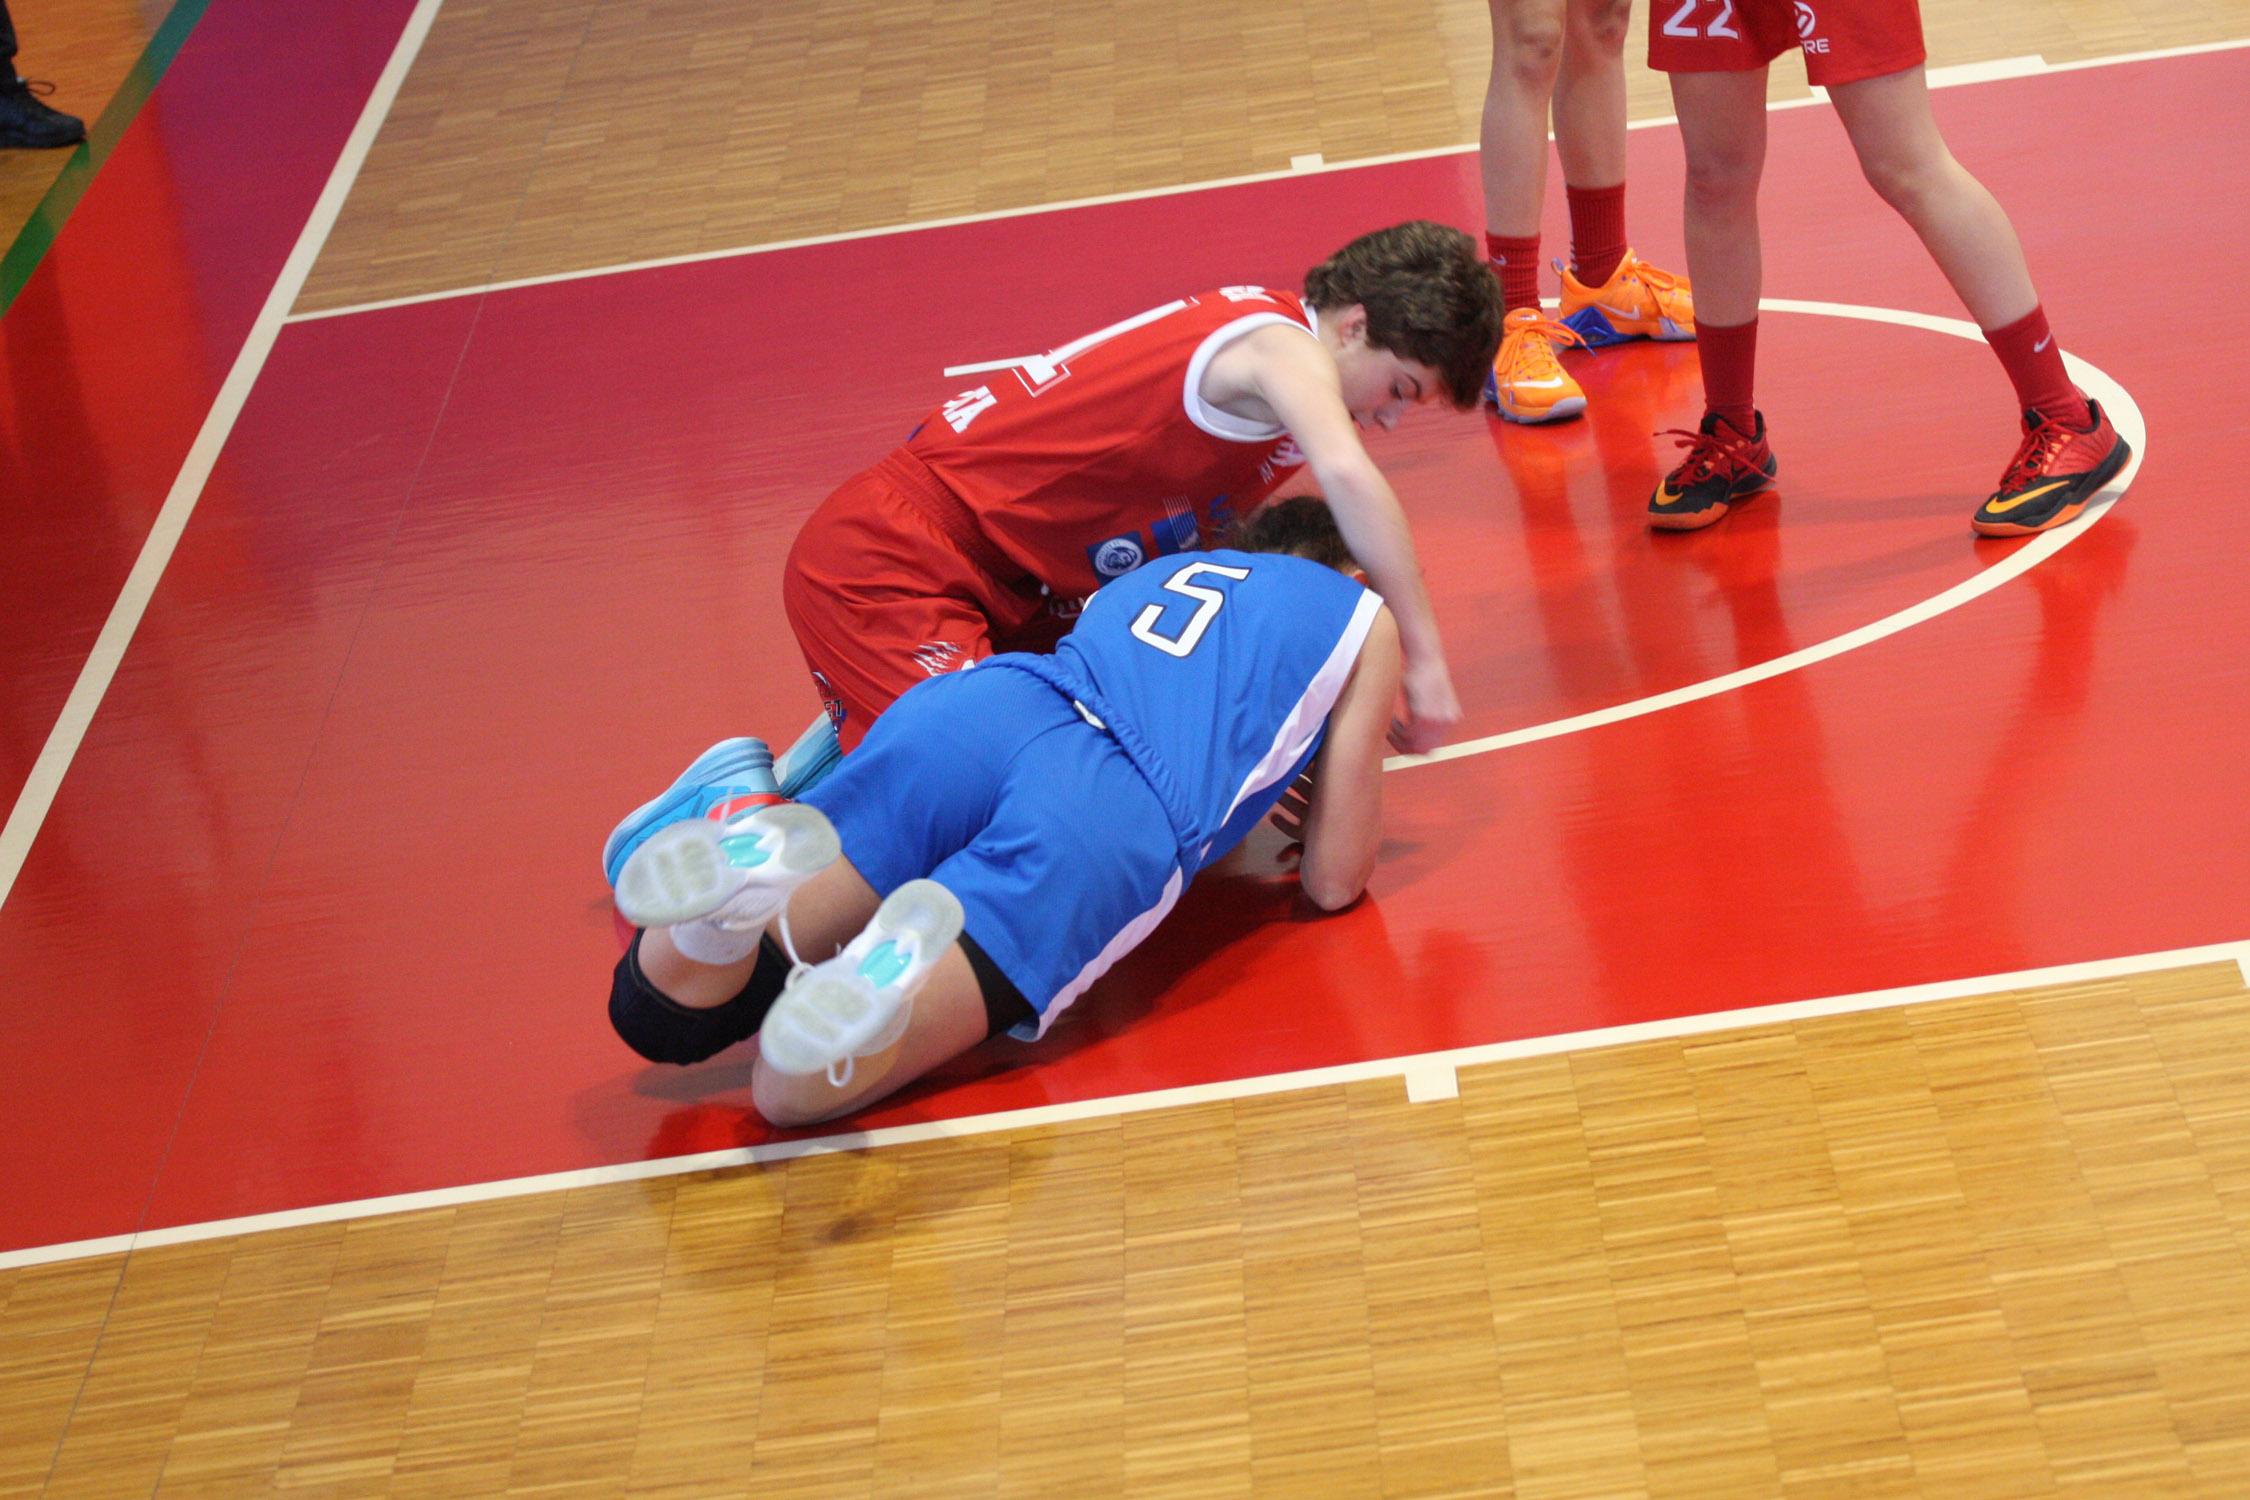 U16E - Costa Masnaga vs Baskettiamo Vittuone 2001 00008.jpg